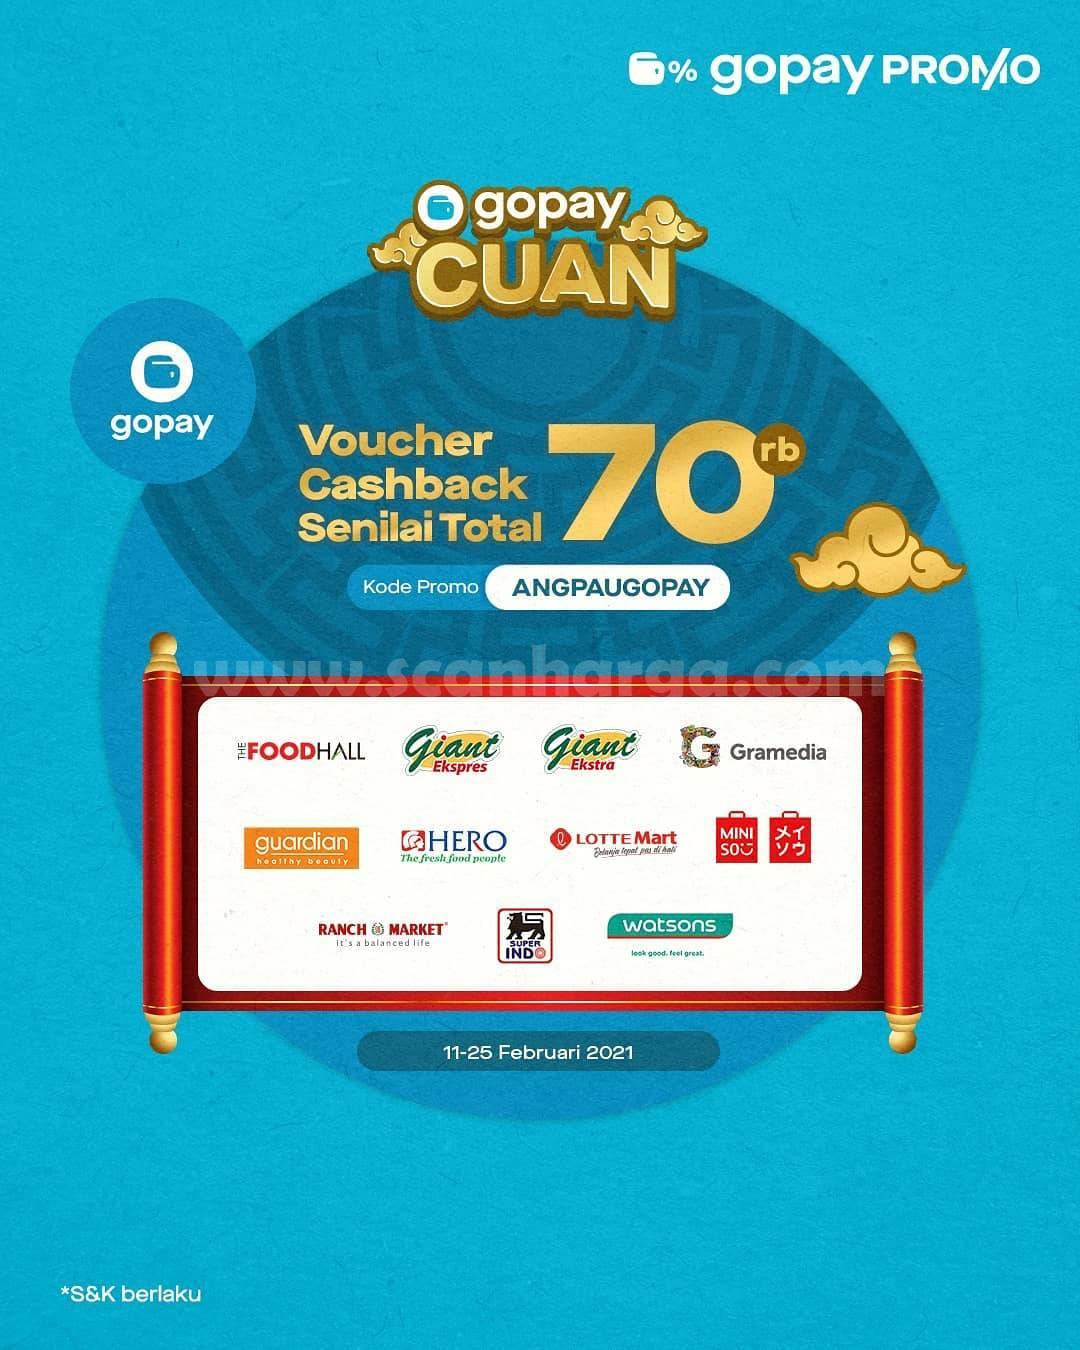 Promo GOPAY CUAN! Dapatkan Voucher Cashback senilai Rp 70Rb